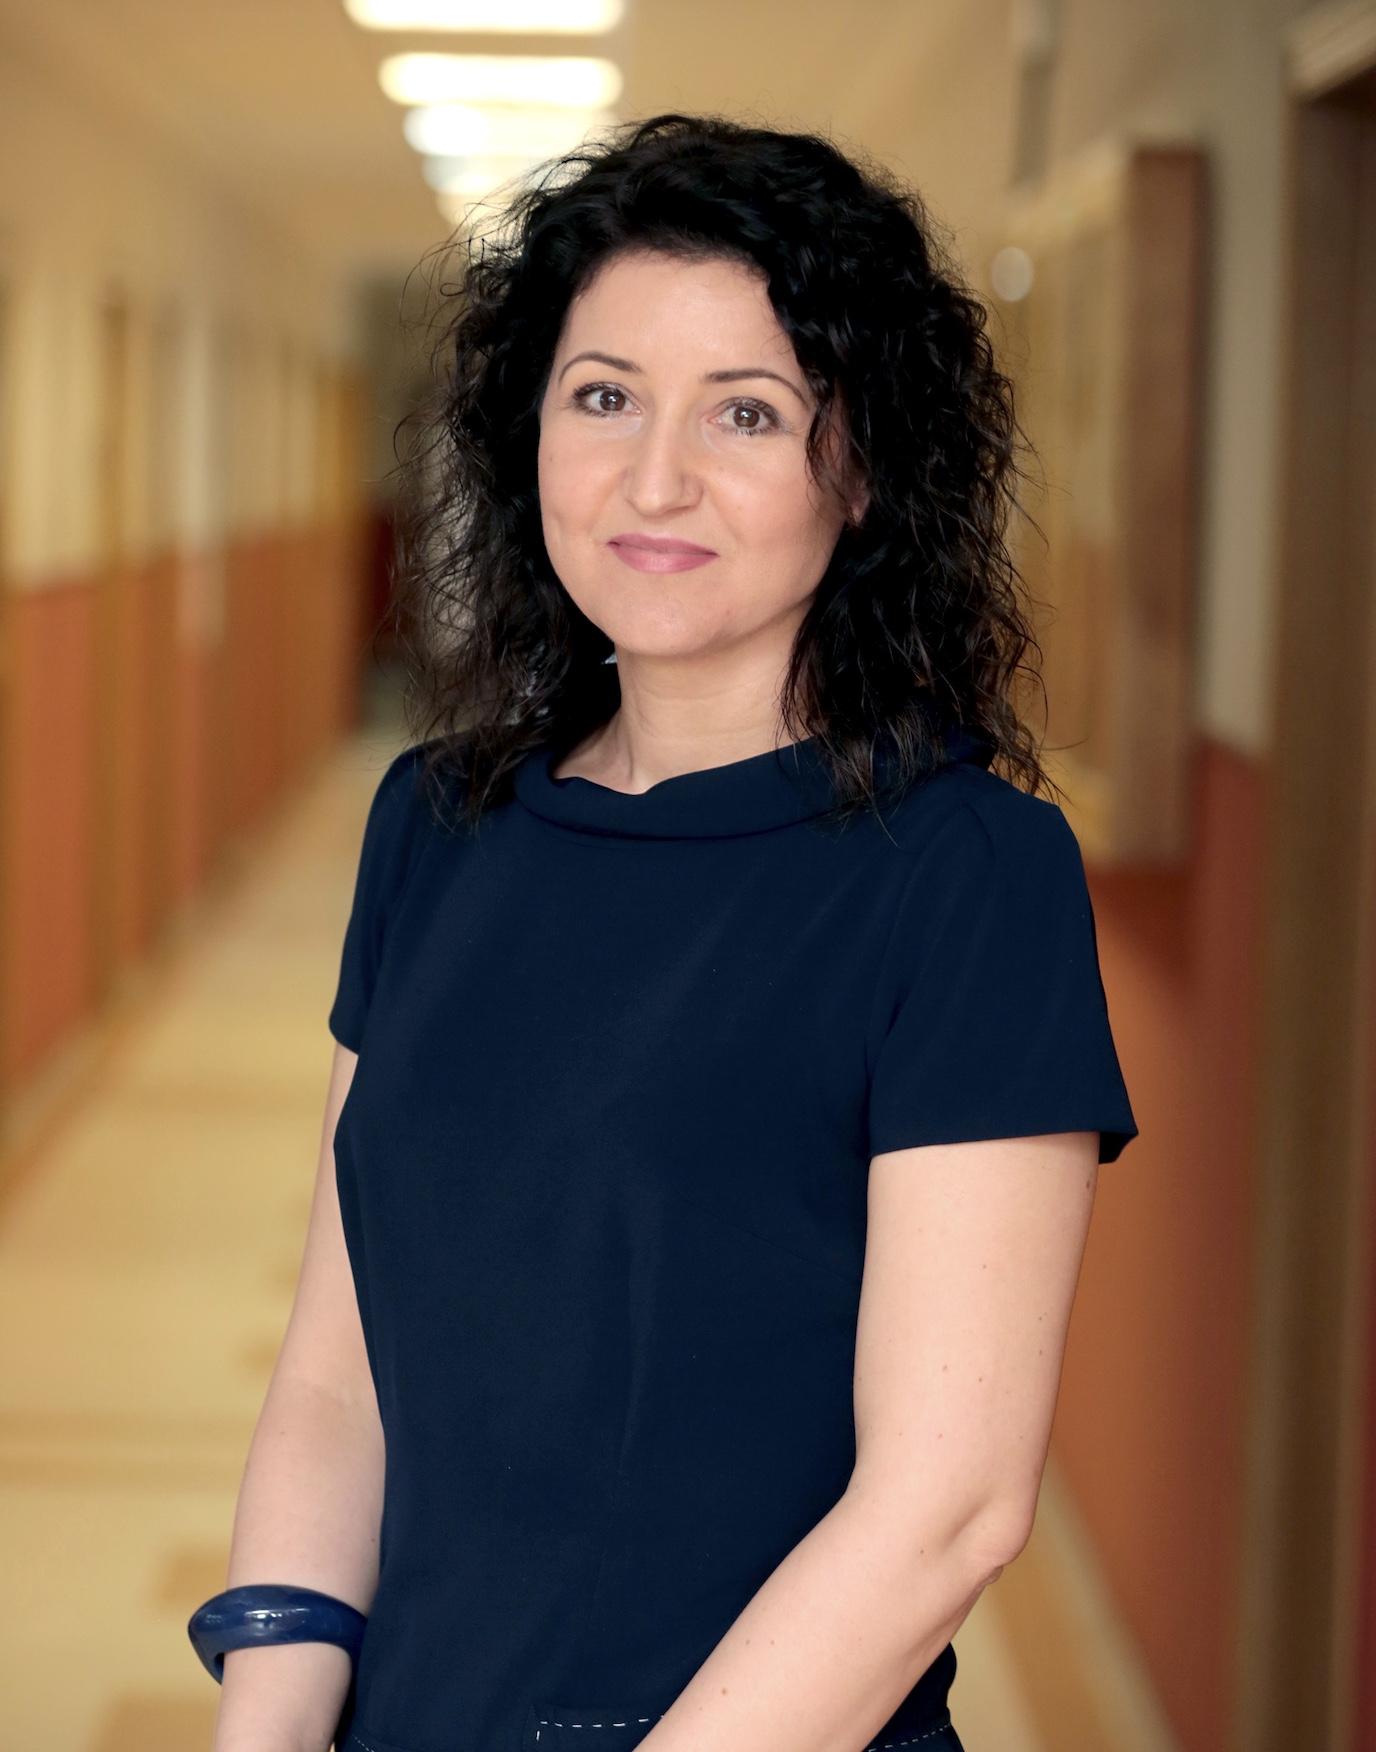 prof. dr hab. Edyta Rudawska, Uniwersytet Szczeciński